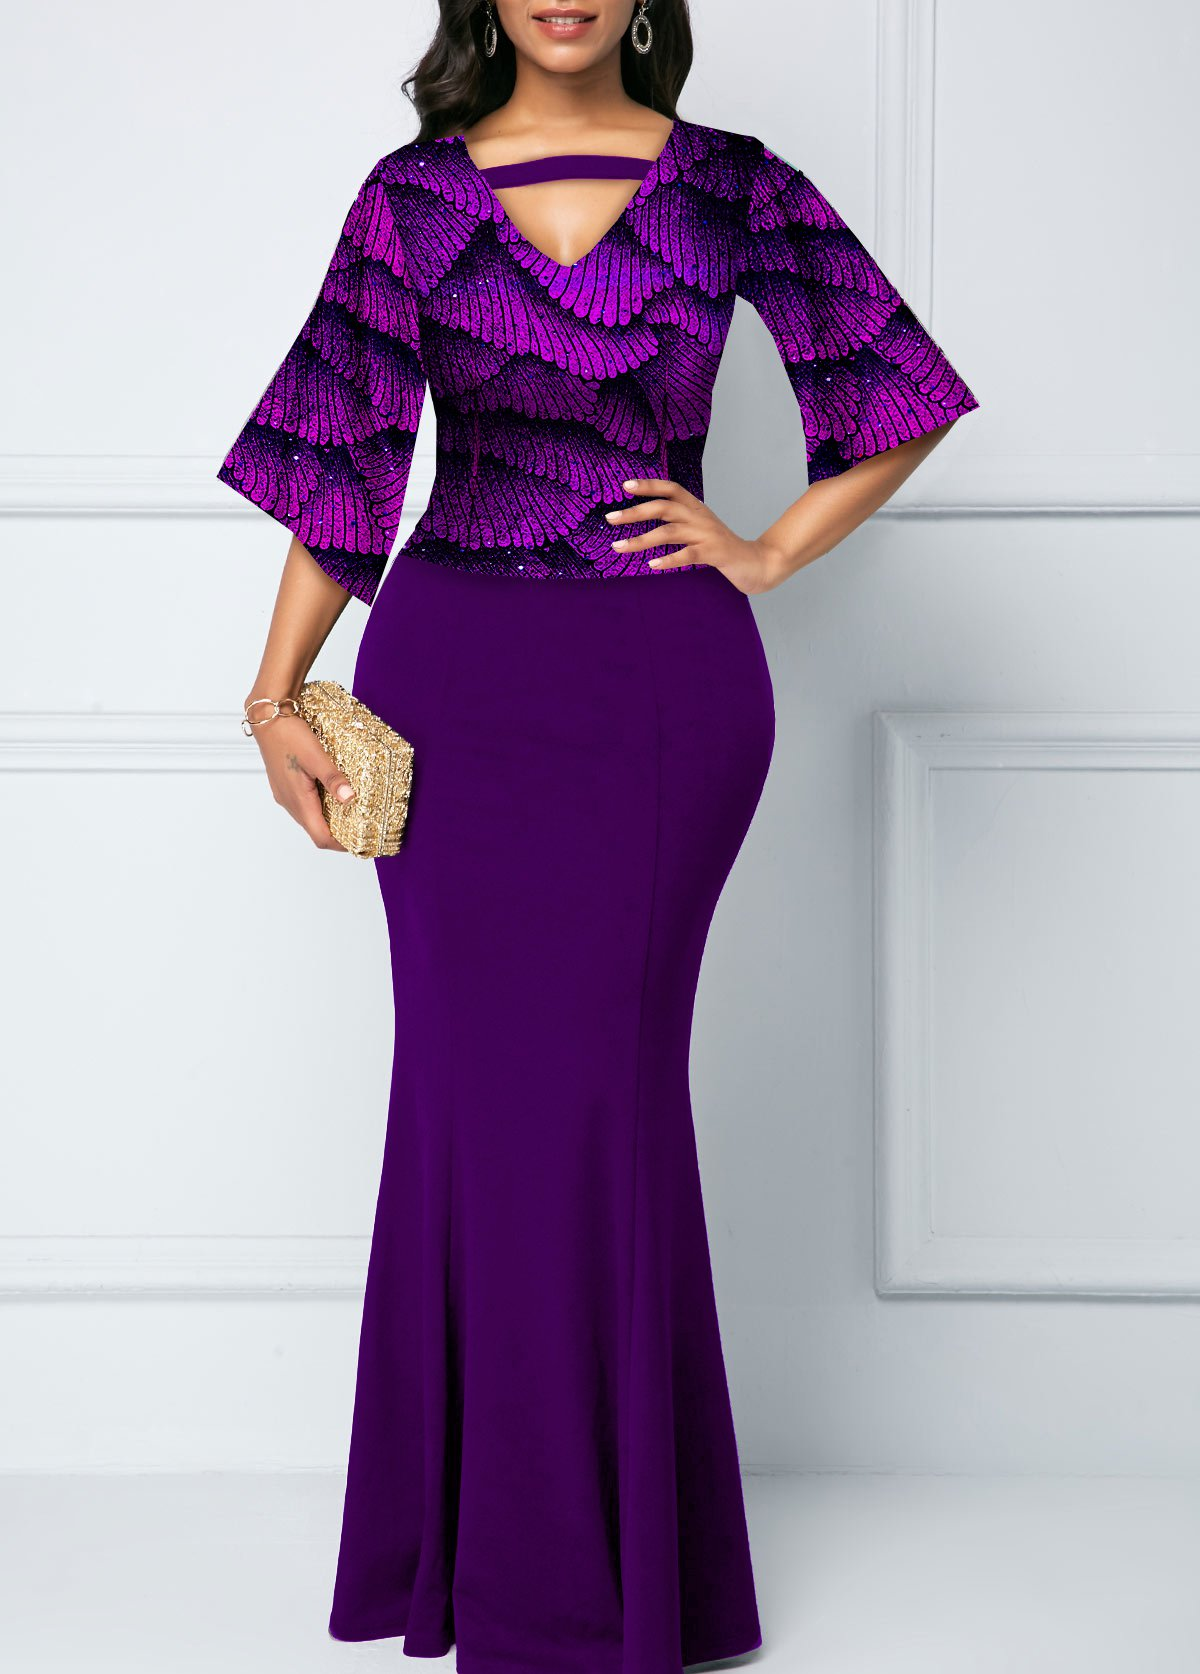 ROTITA Sequin Hot Stamping Print 3/4 Sleeve Mermaid Dress